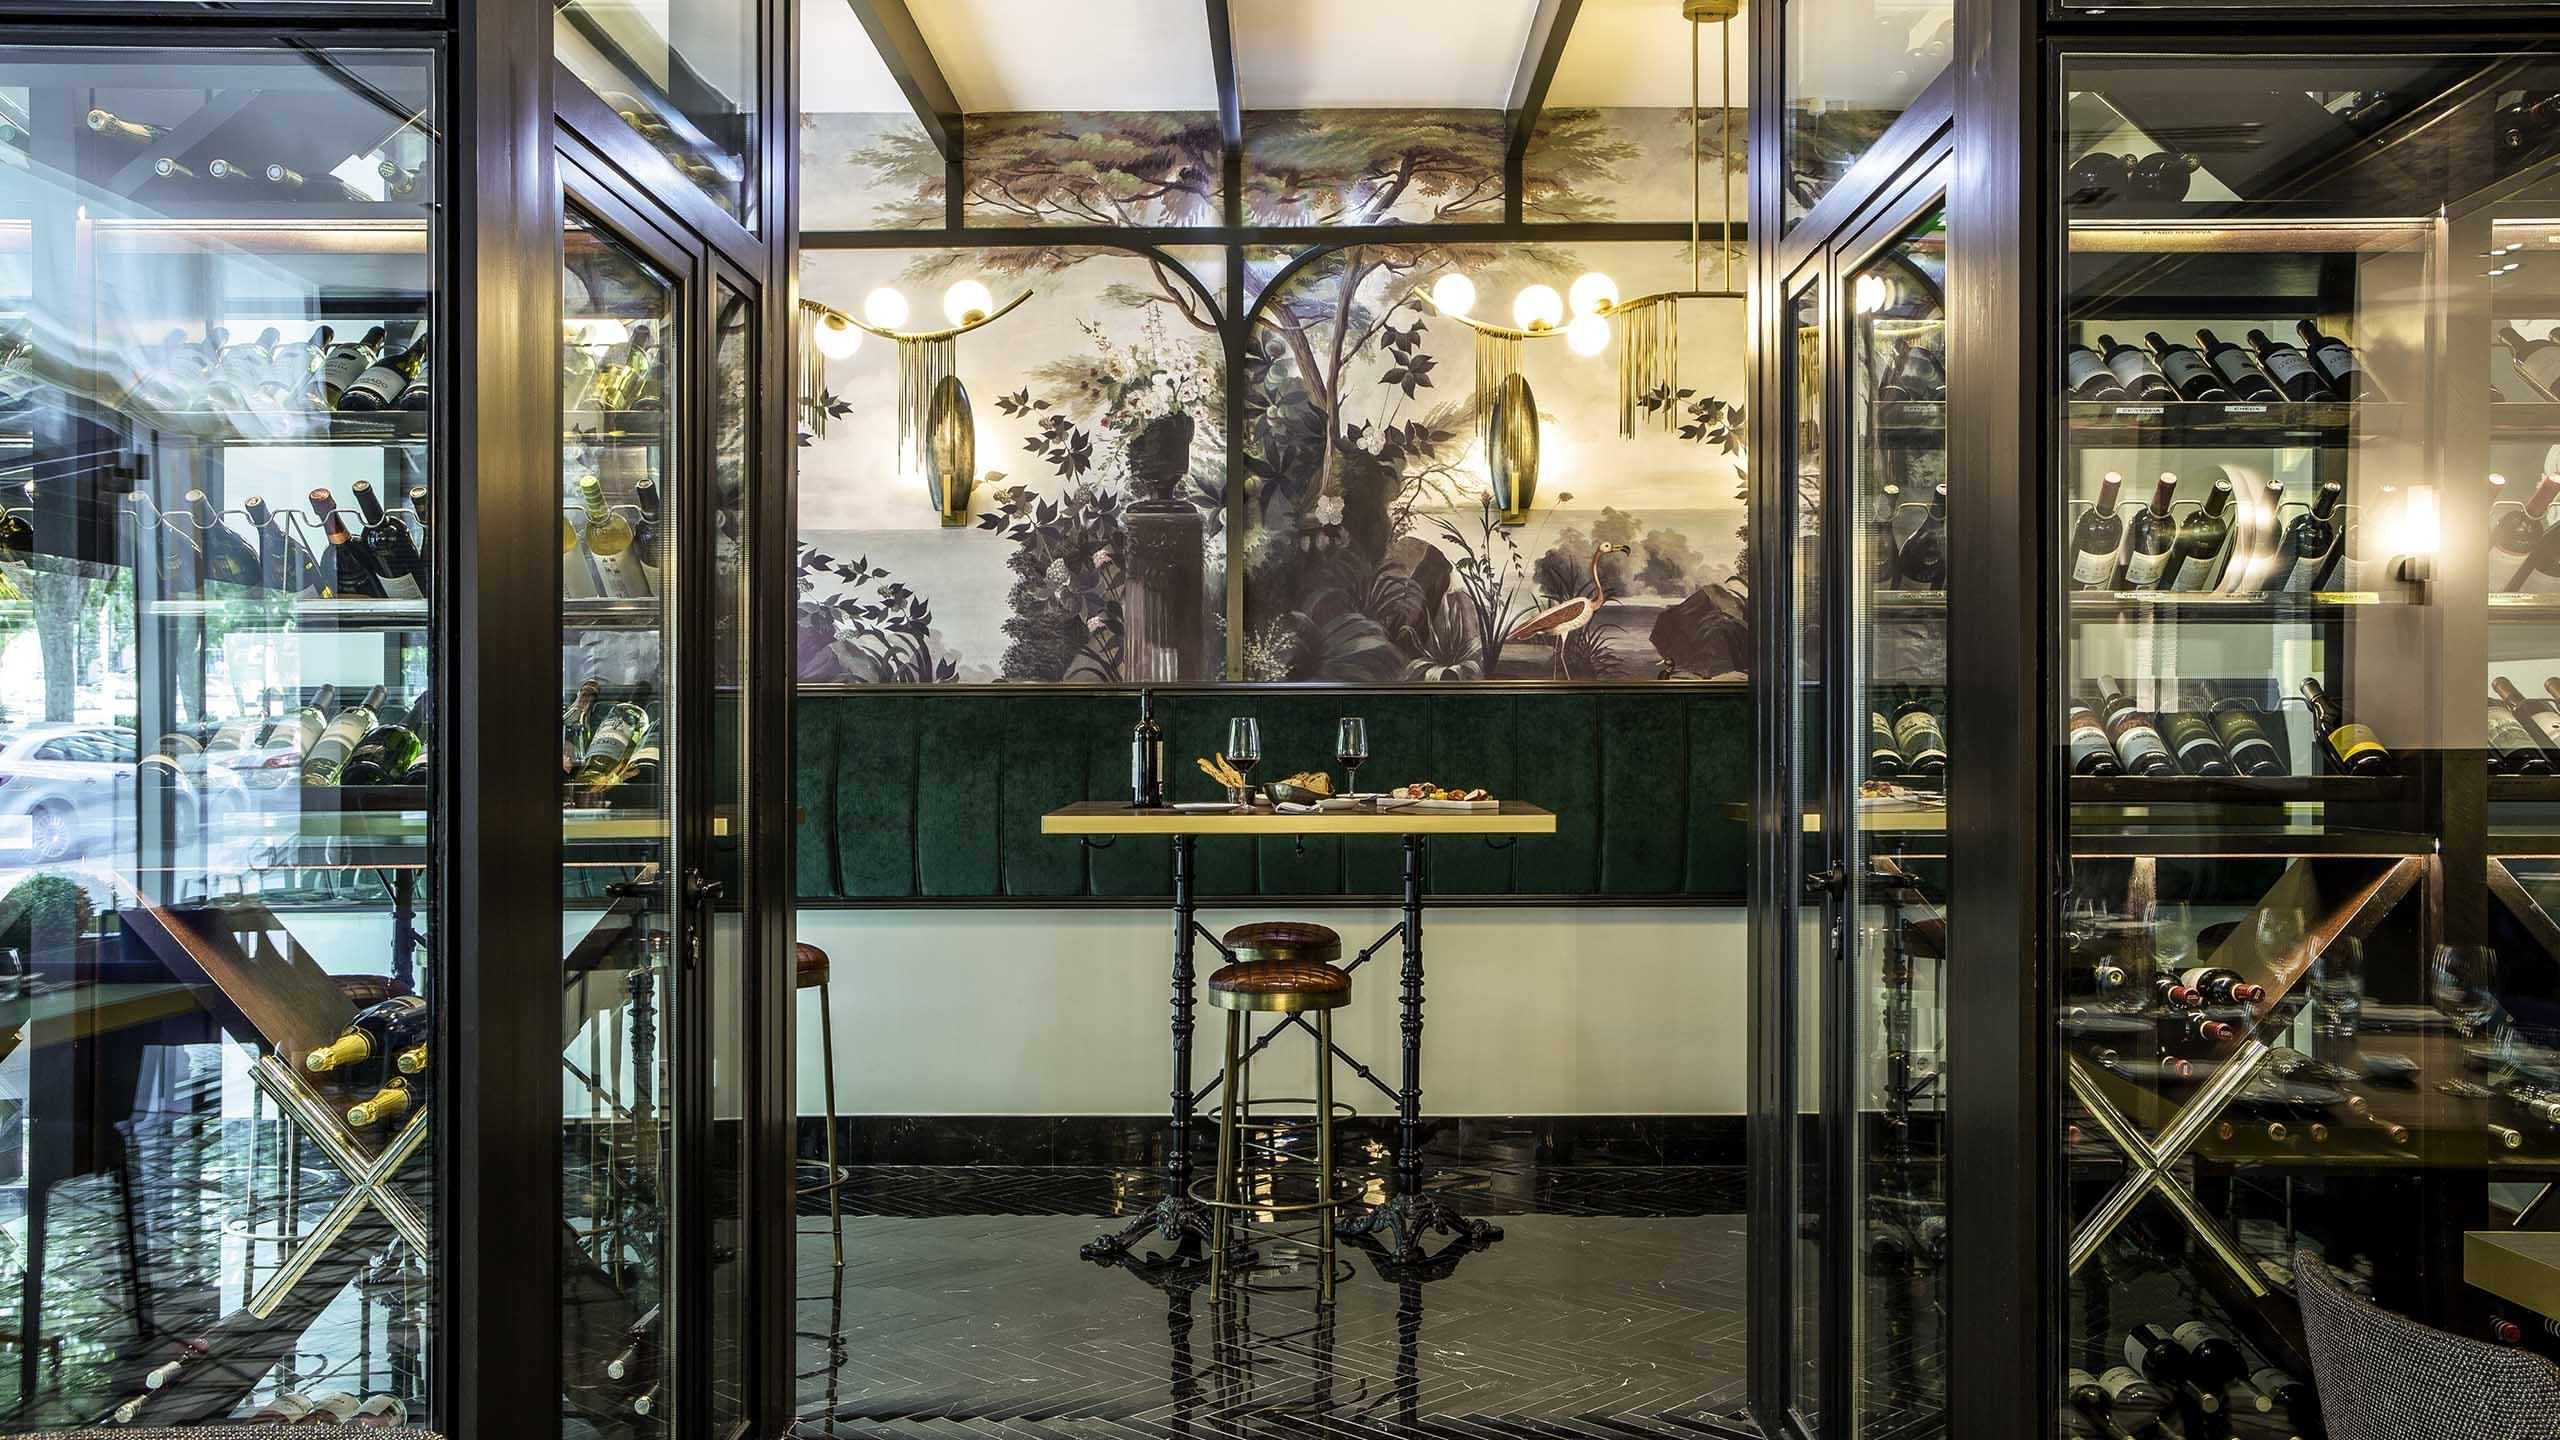 sterne restaurant paris